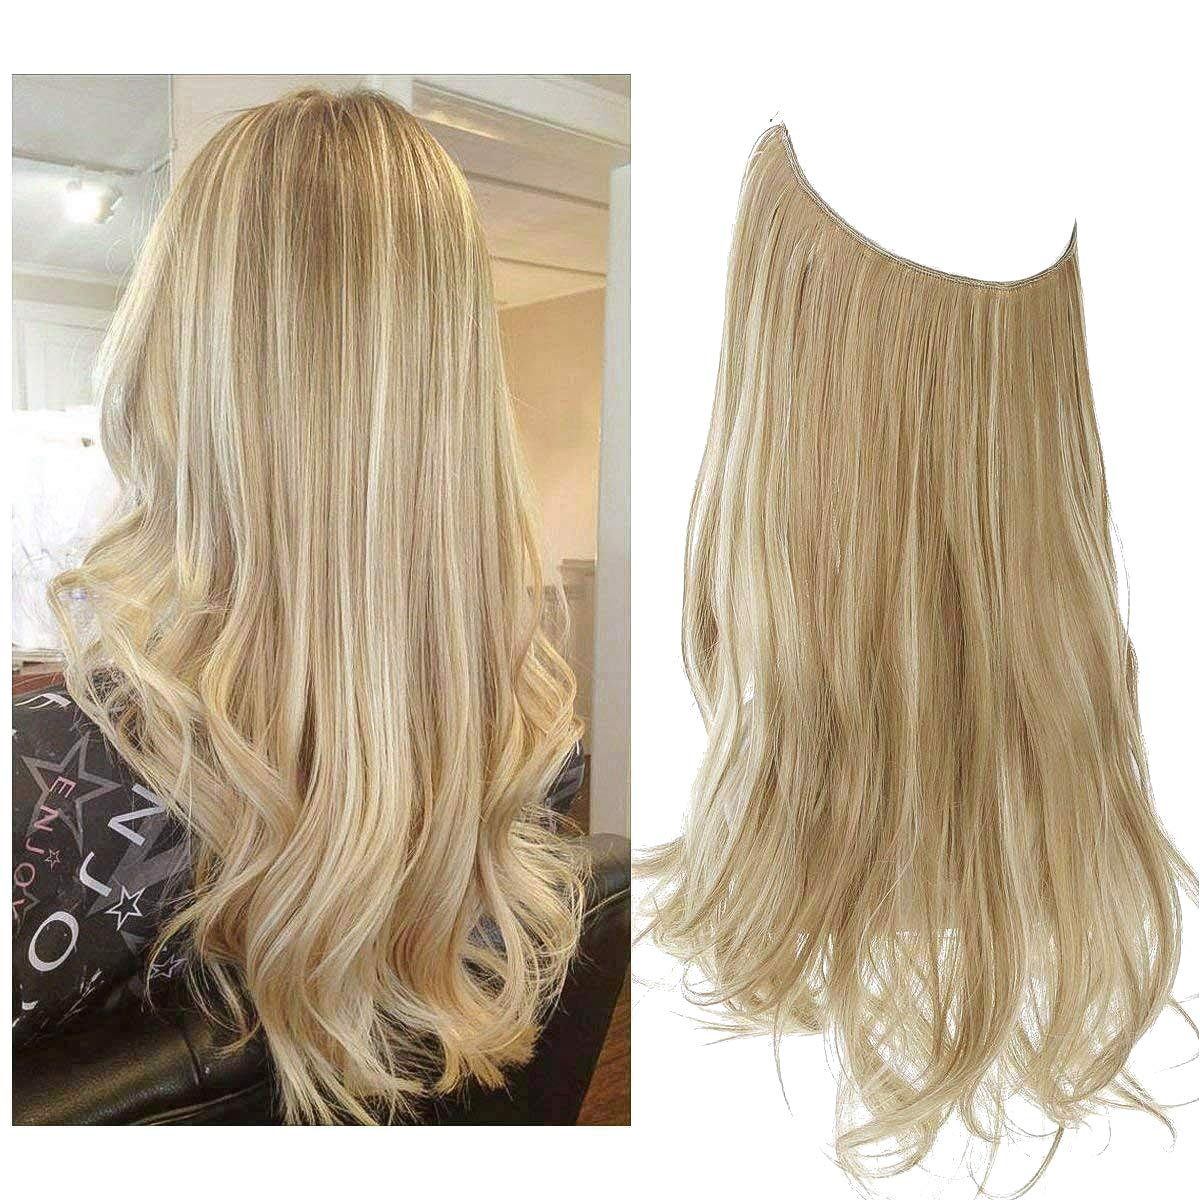 SARLA Dirty Blonde Hair Extension Wavy Halo Highlight Curly Minneapolis Mall Superlatite Long